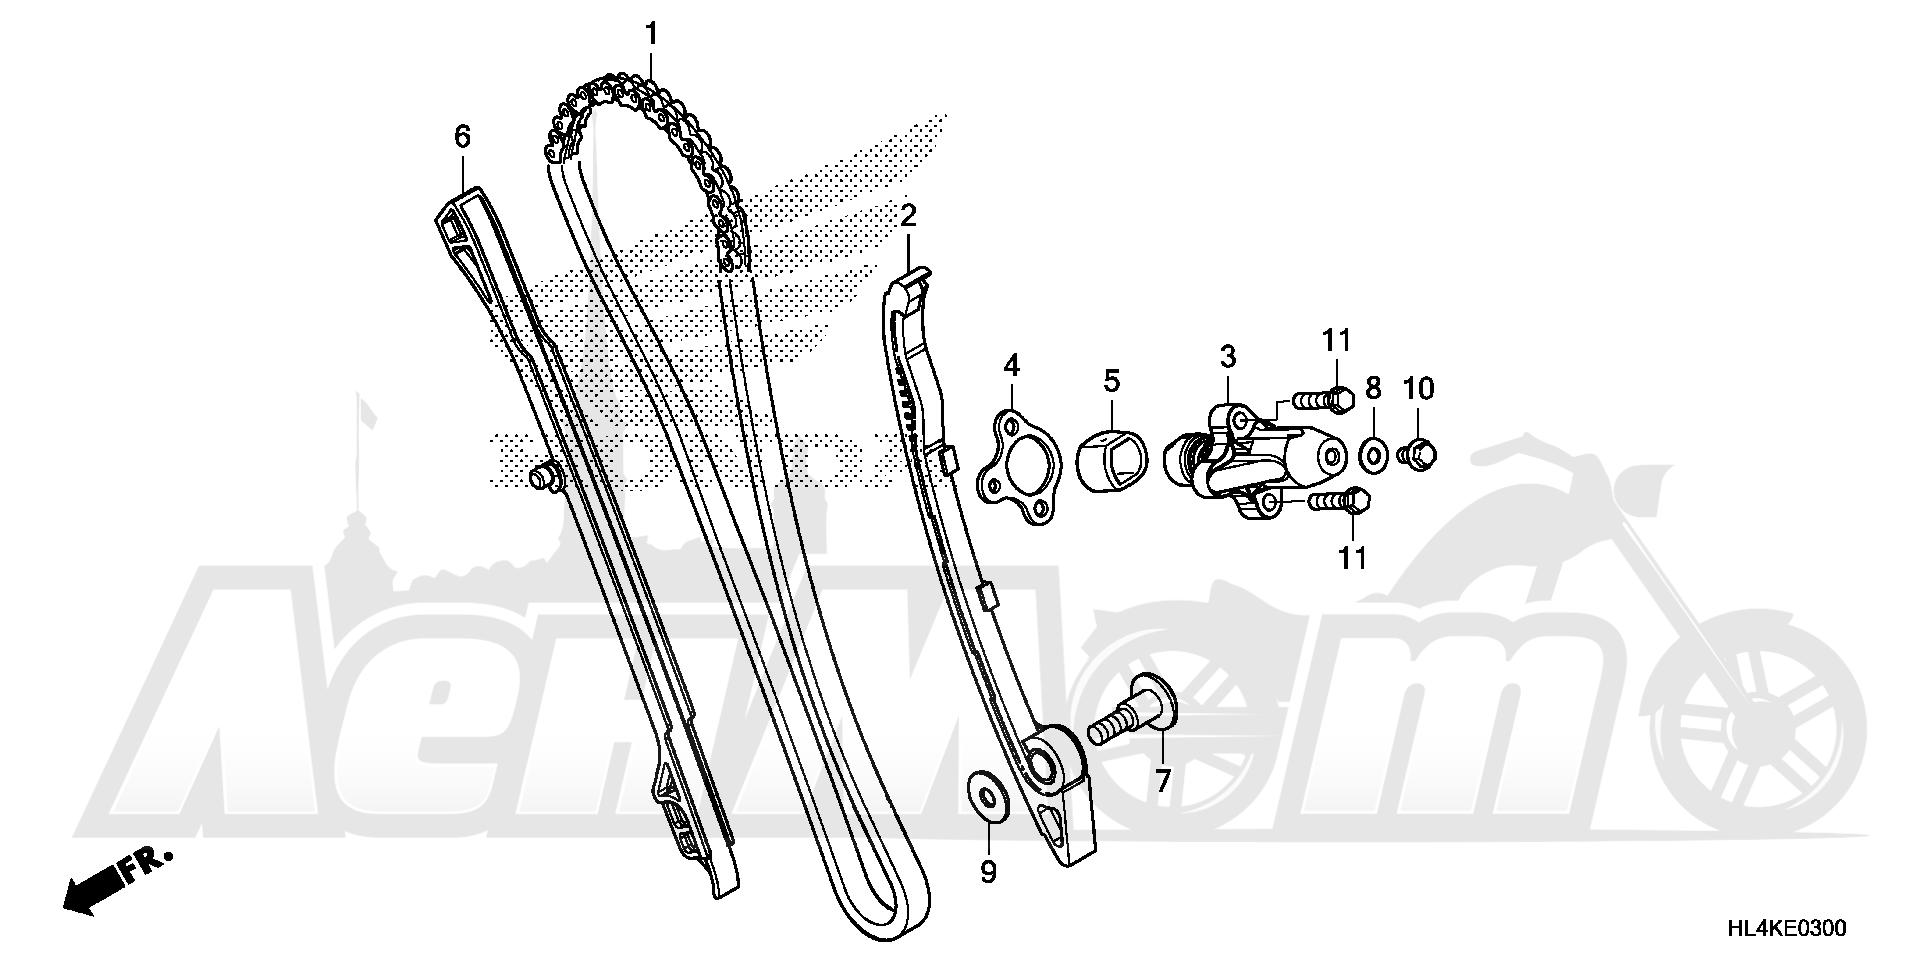 Запчасти для Квадроцикла Honda 2019 SXS1000M3P Раздел: CAM CHAIN AND TENSIONER | цепь грм и натяжитель